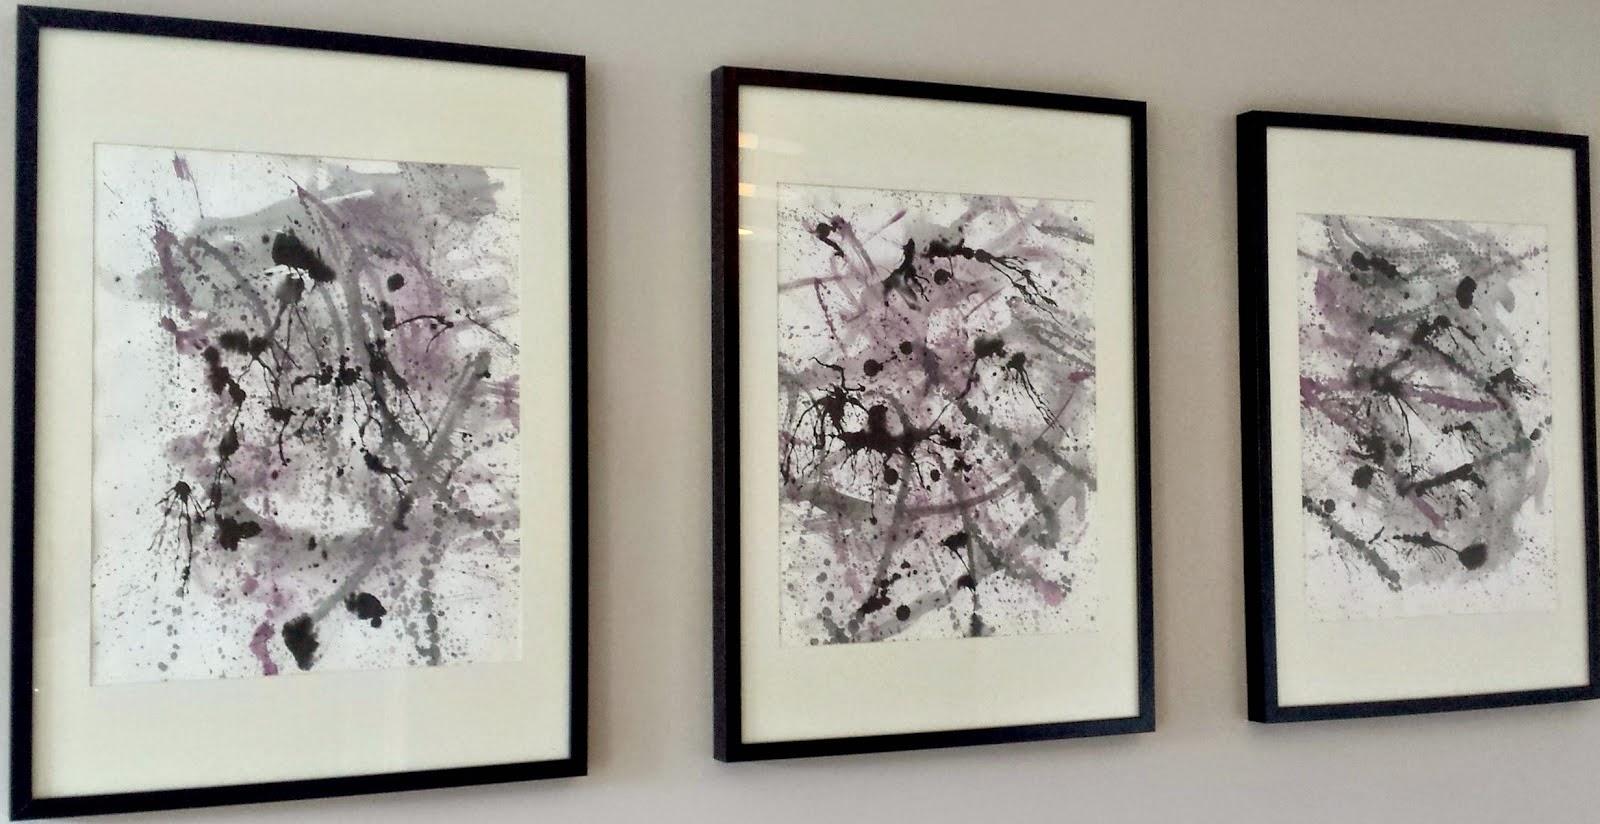 http://portialawrie.blogspot.co.uk/2014/11/easiest-ever-diy-wall-art.html